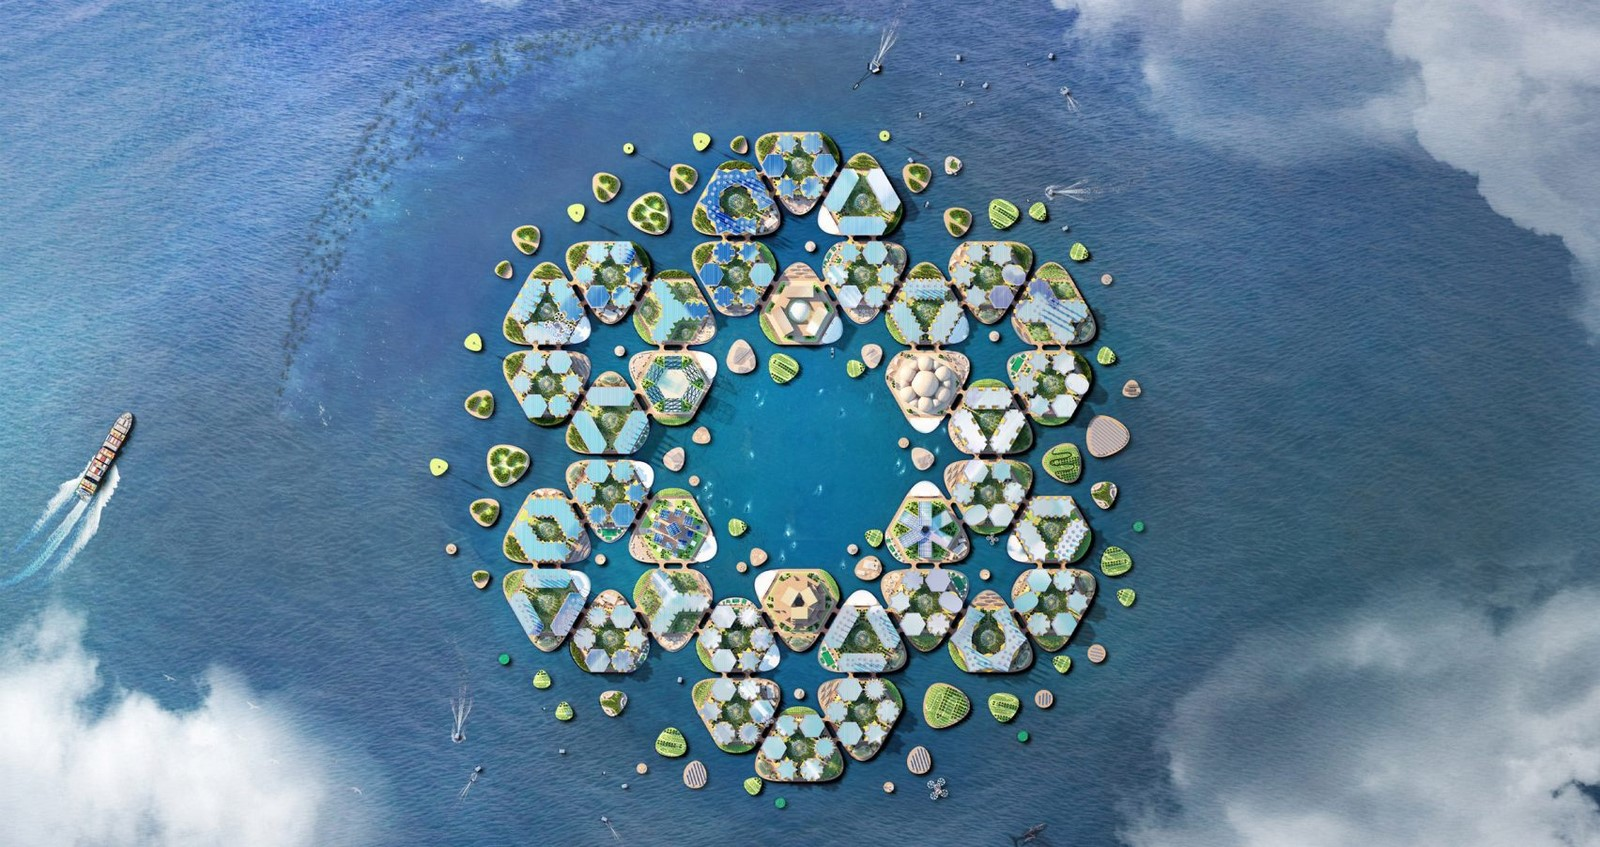 Oceanix City by Bjarke Ingles: The Floating City - Sheet2